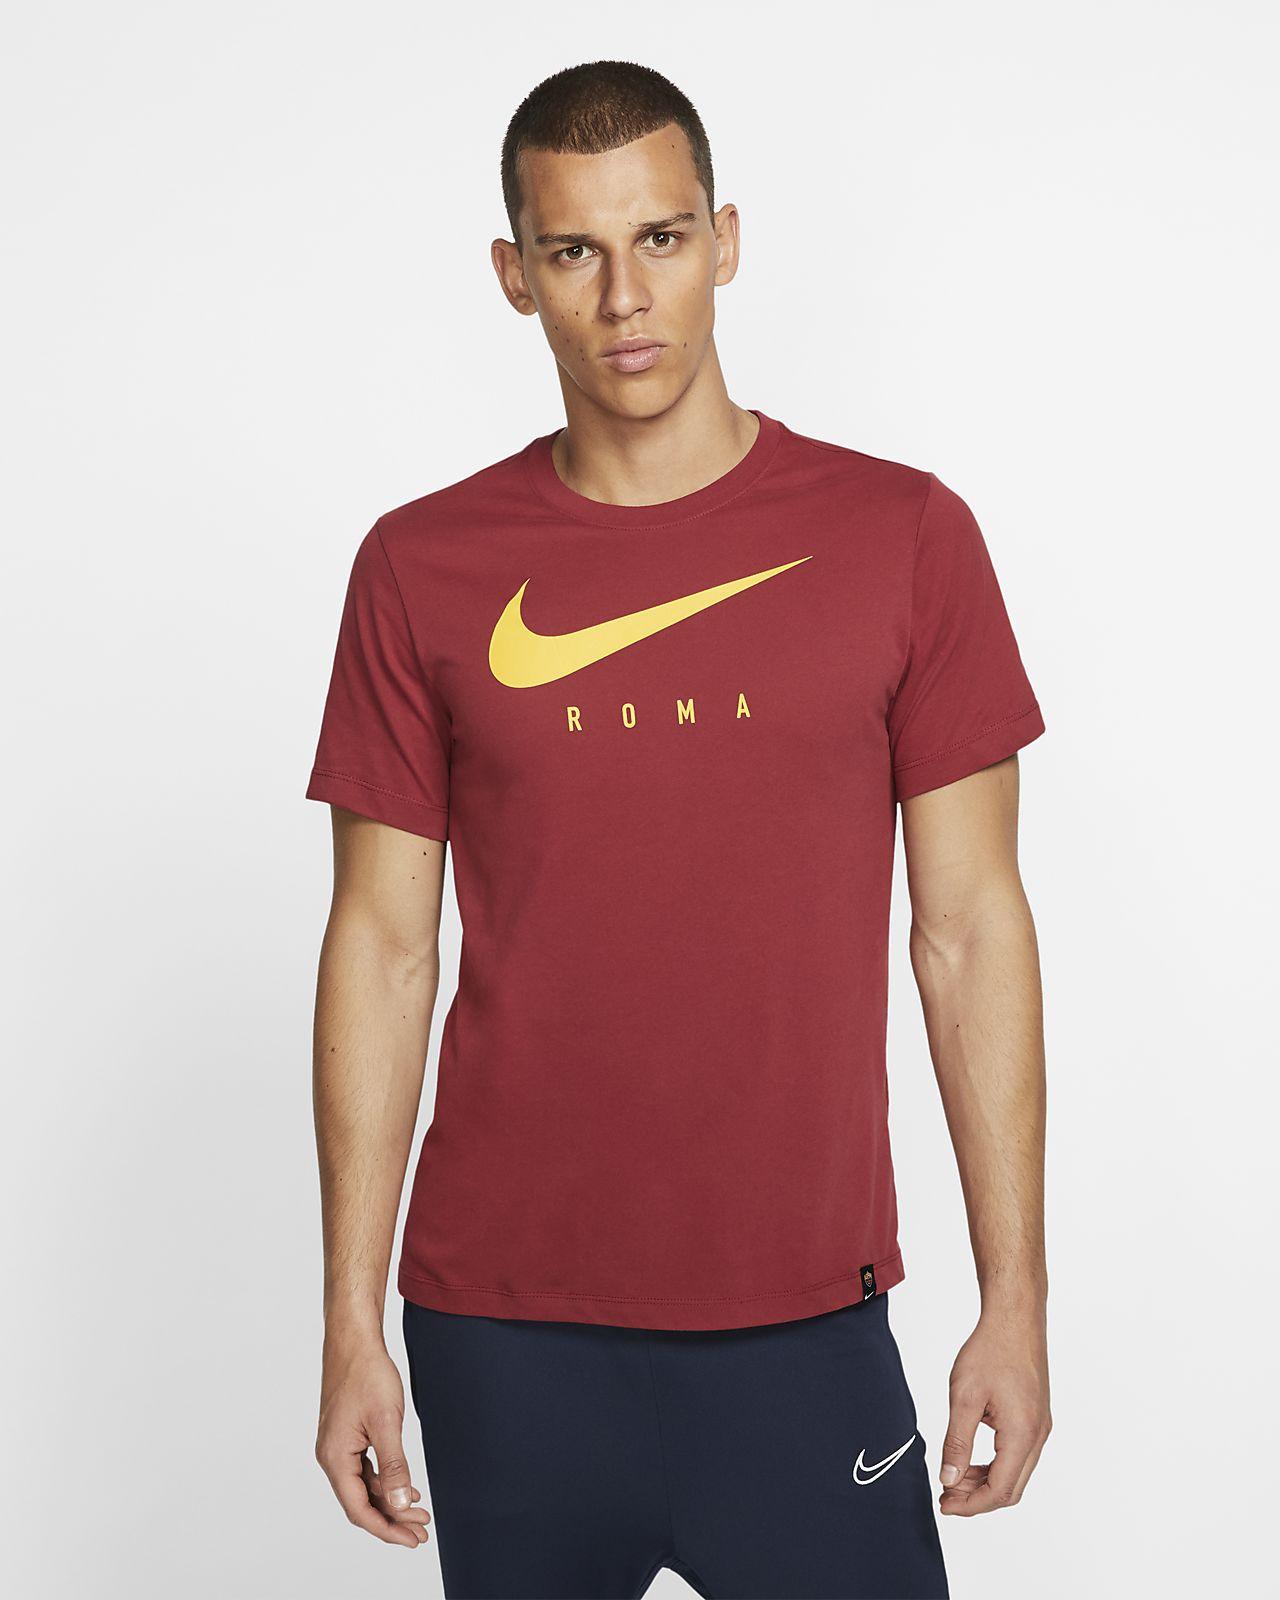 A.S. Roma Men's Football T-Shirt